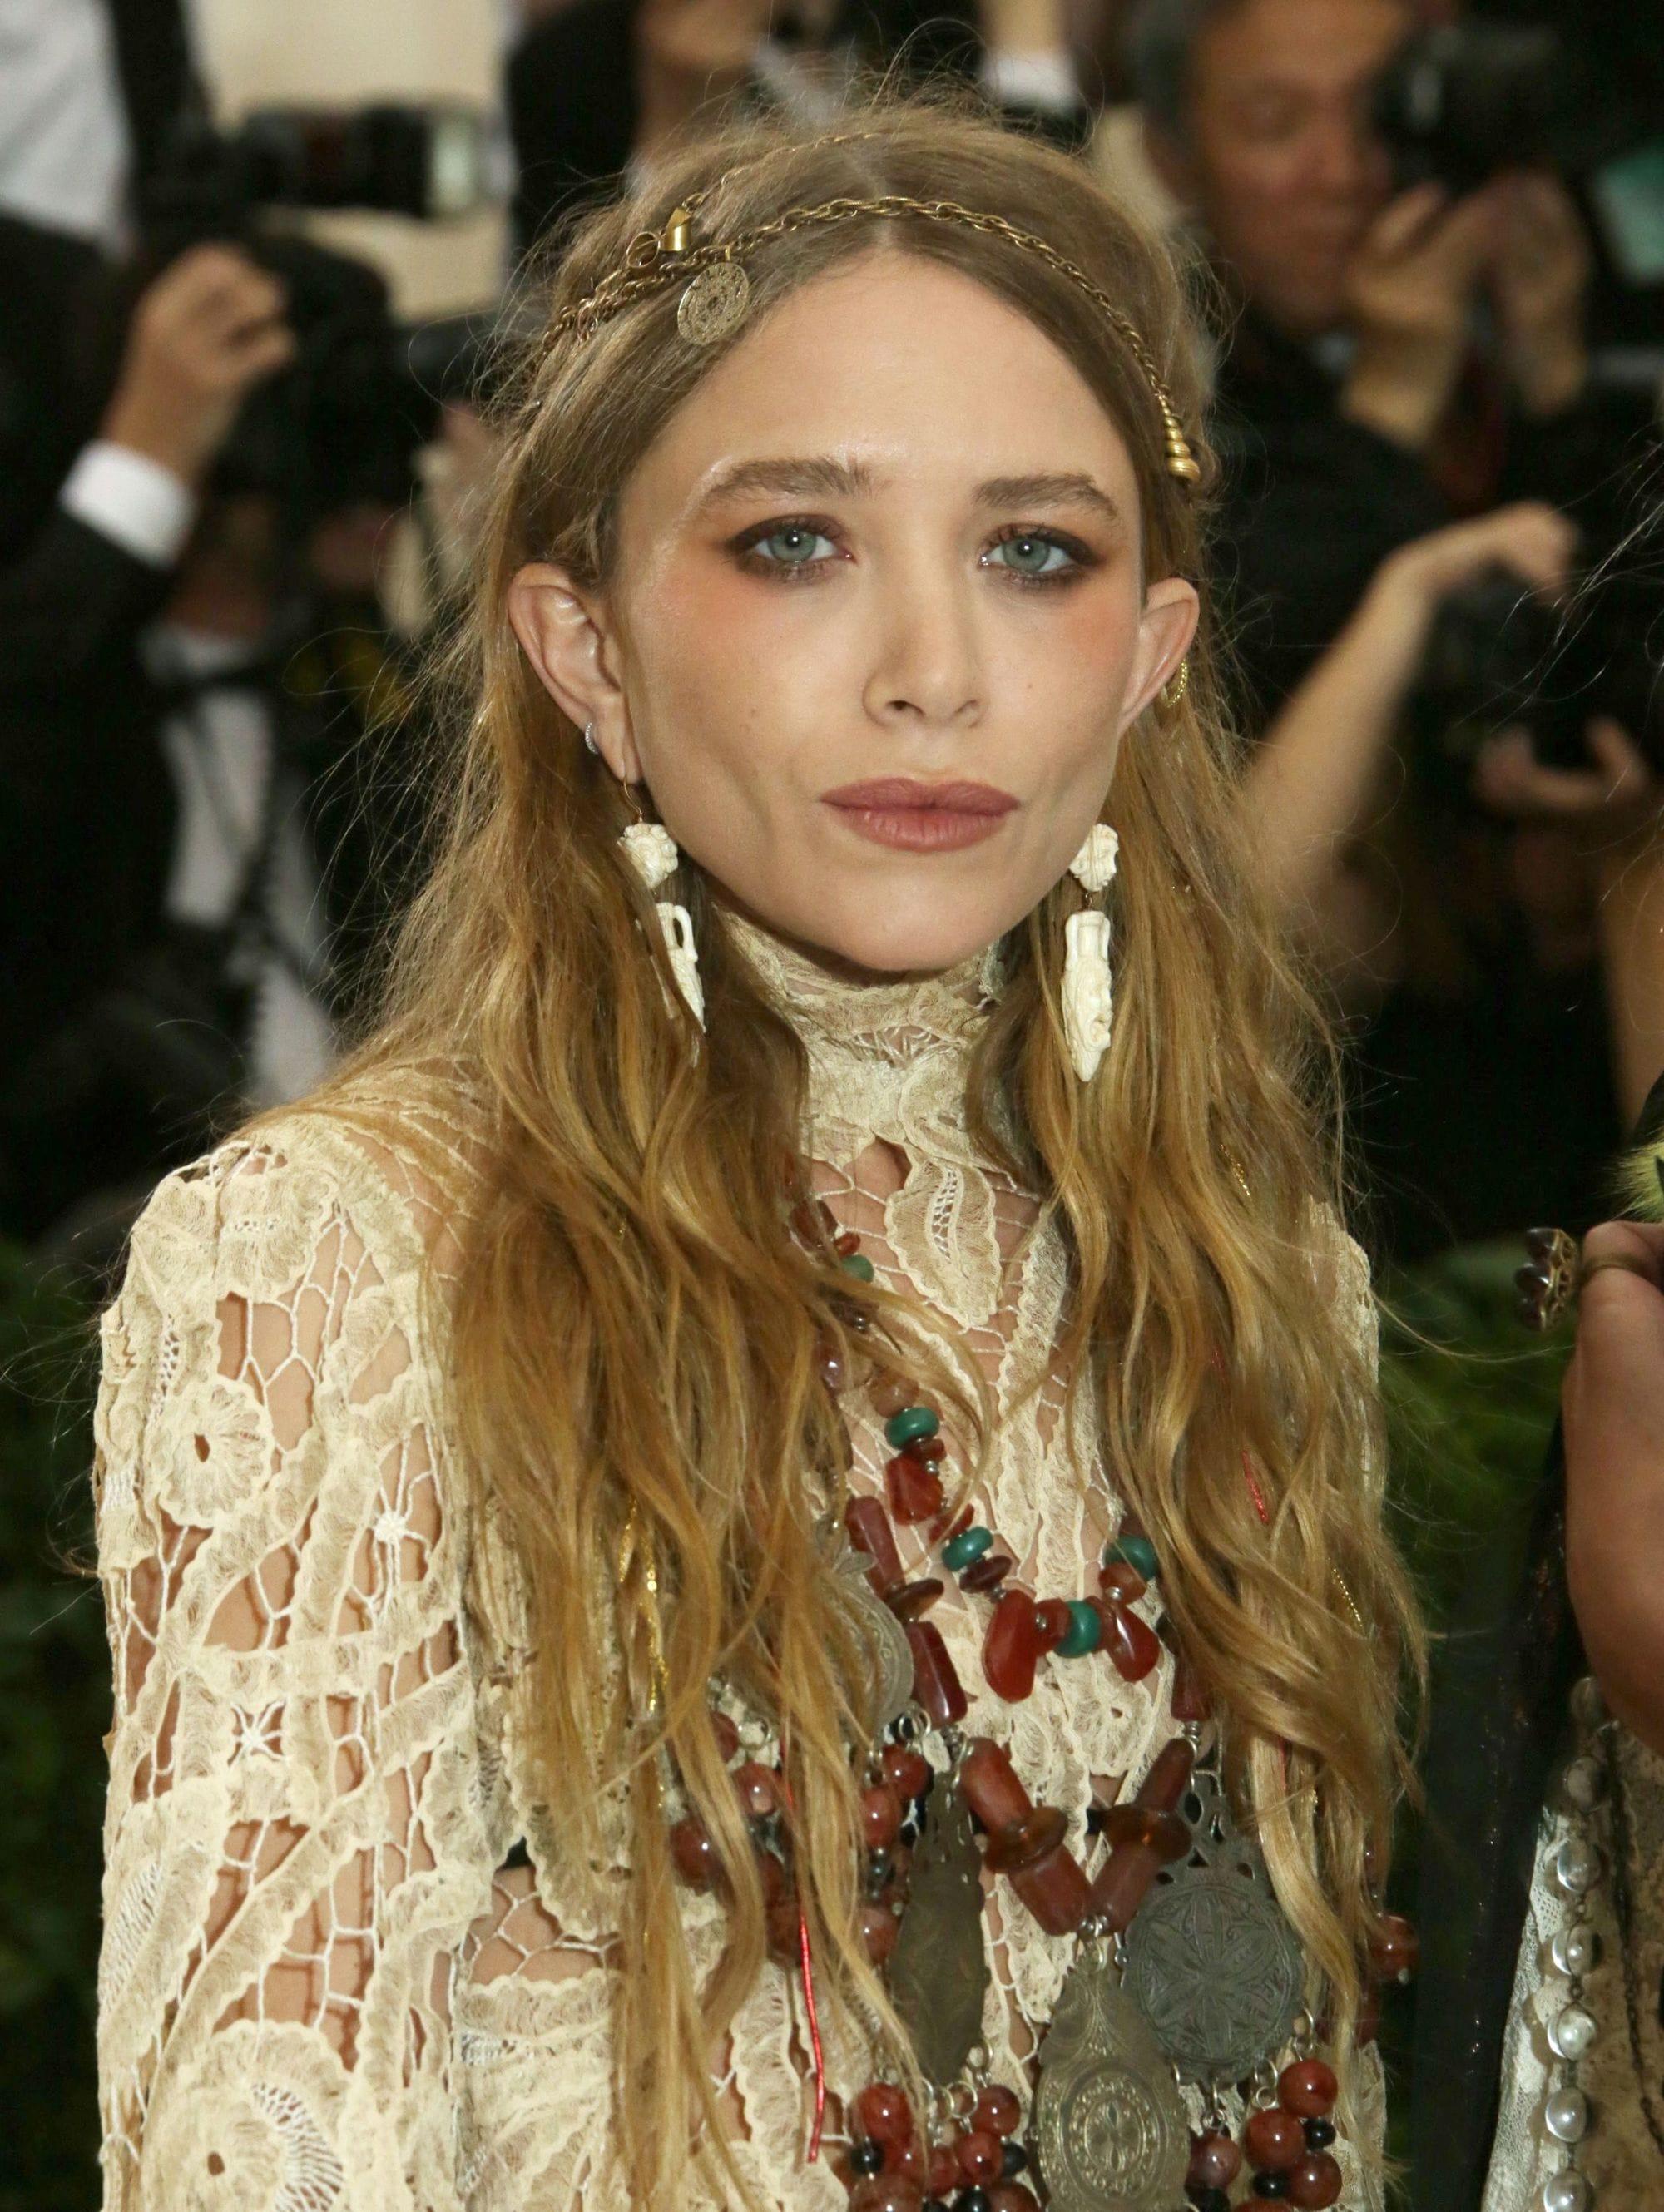 Mary-Kate Olsen - strawberry blonde hair - long boho waves